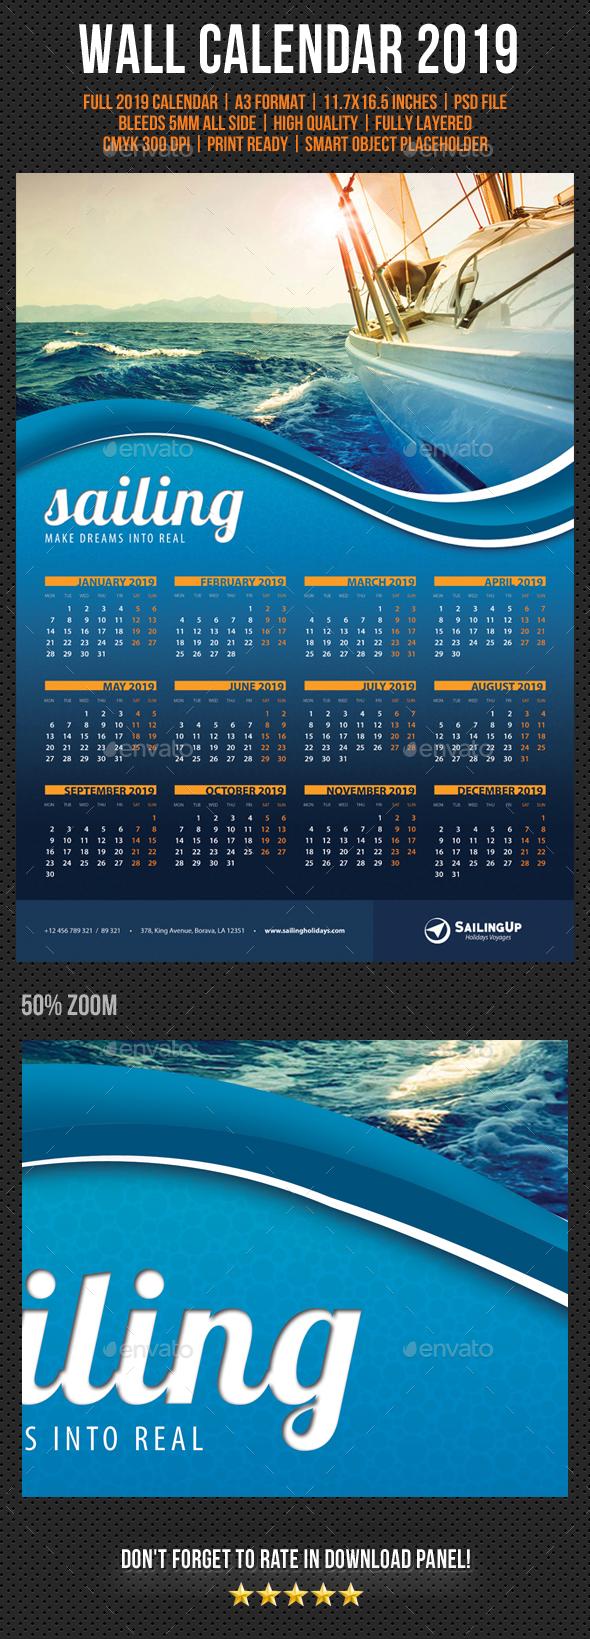 Wall Calendar A3 2019 V01 - Calendars Stationery